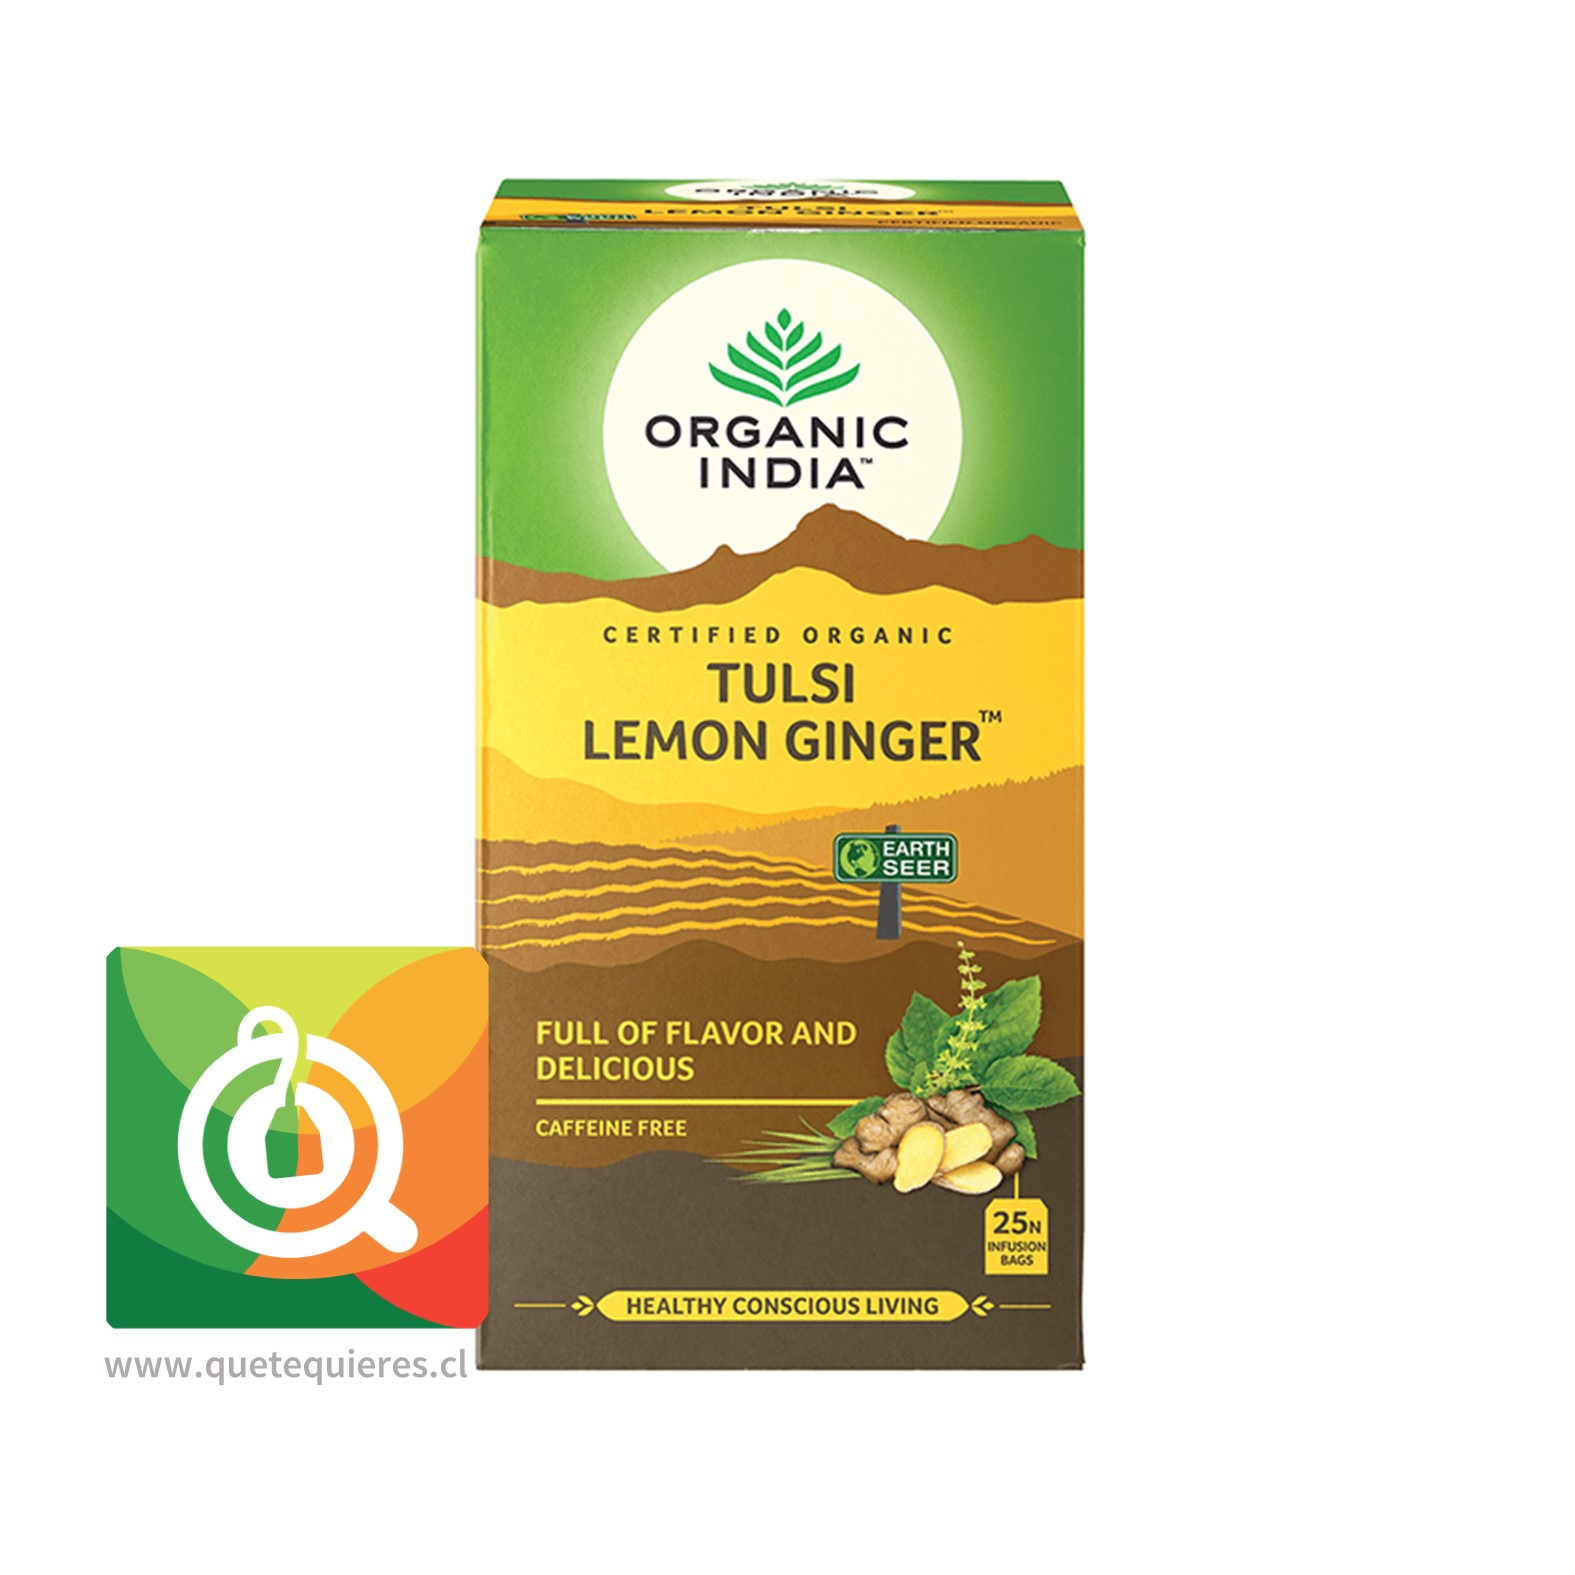 Organic India Tulsi Lemon Ginger- Infusión Orgánica Tulsi, Limón y Jengibre